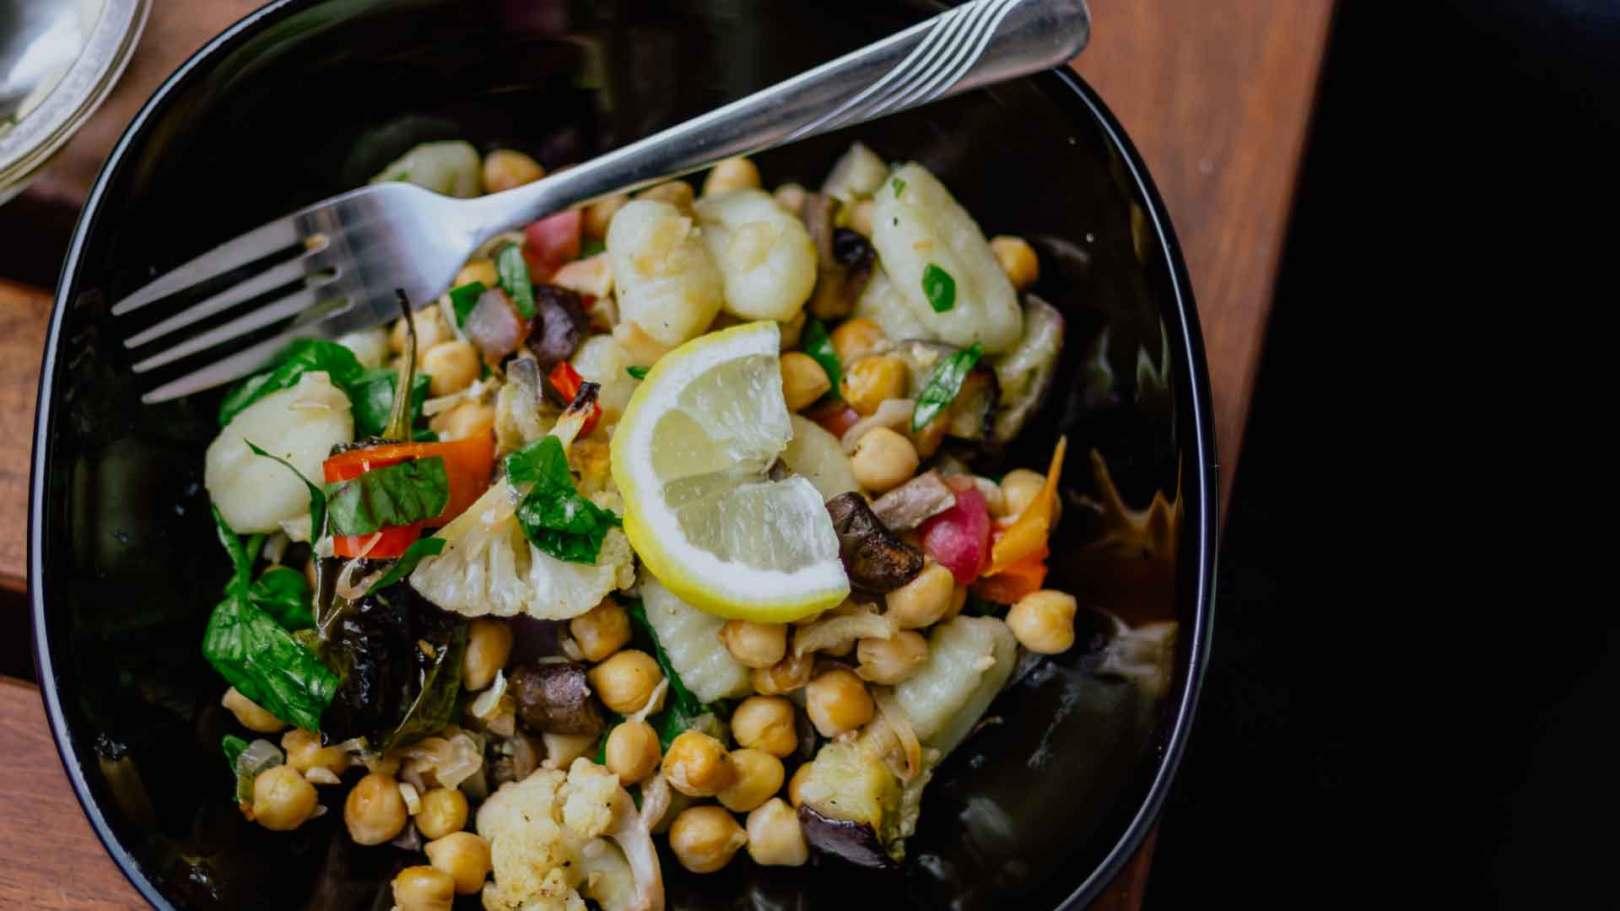 Salade croquante de pois chiches